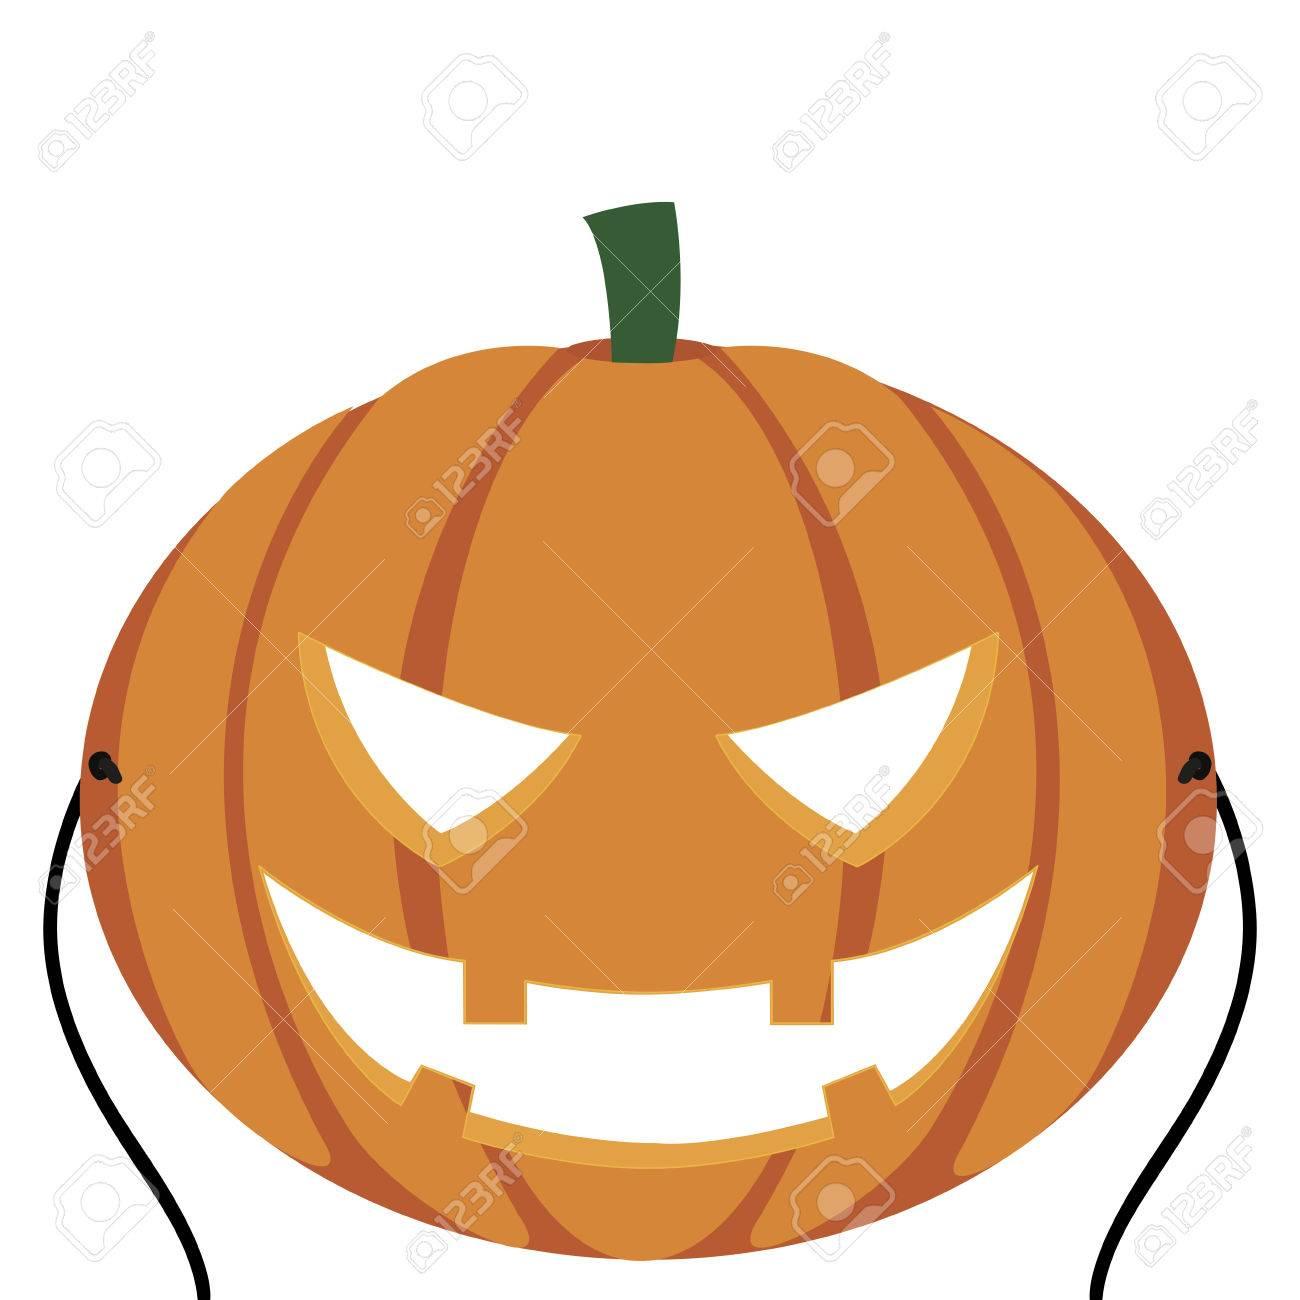 abstract cute halloween mask